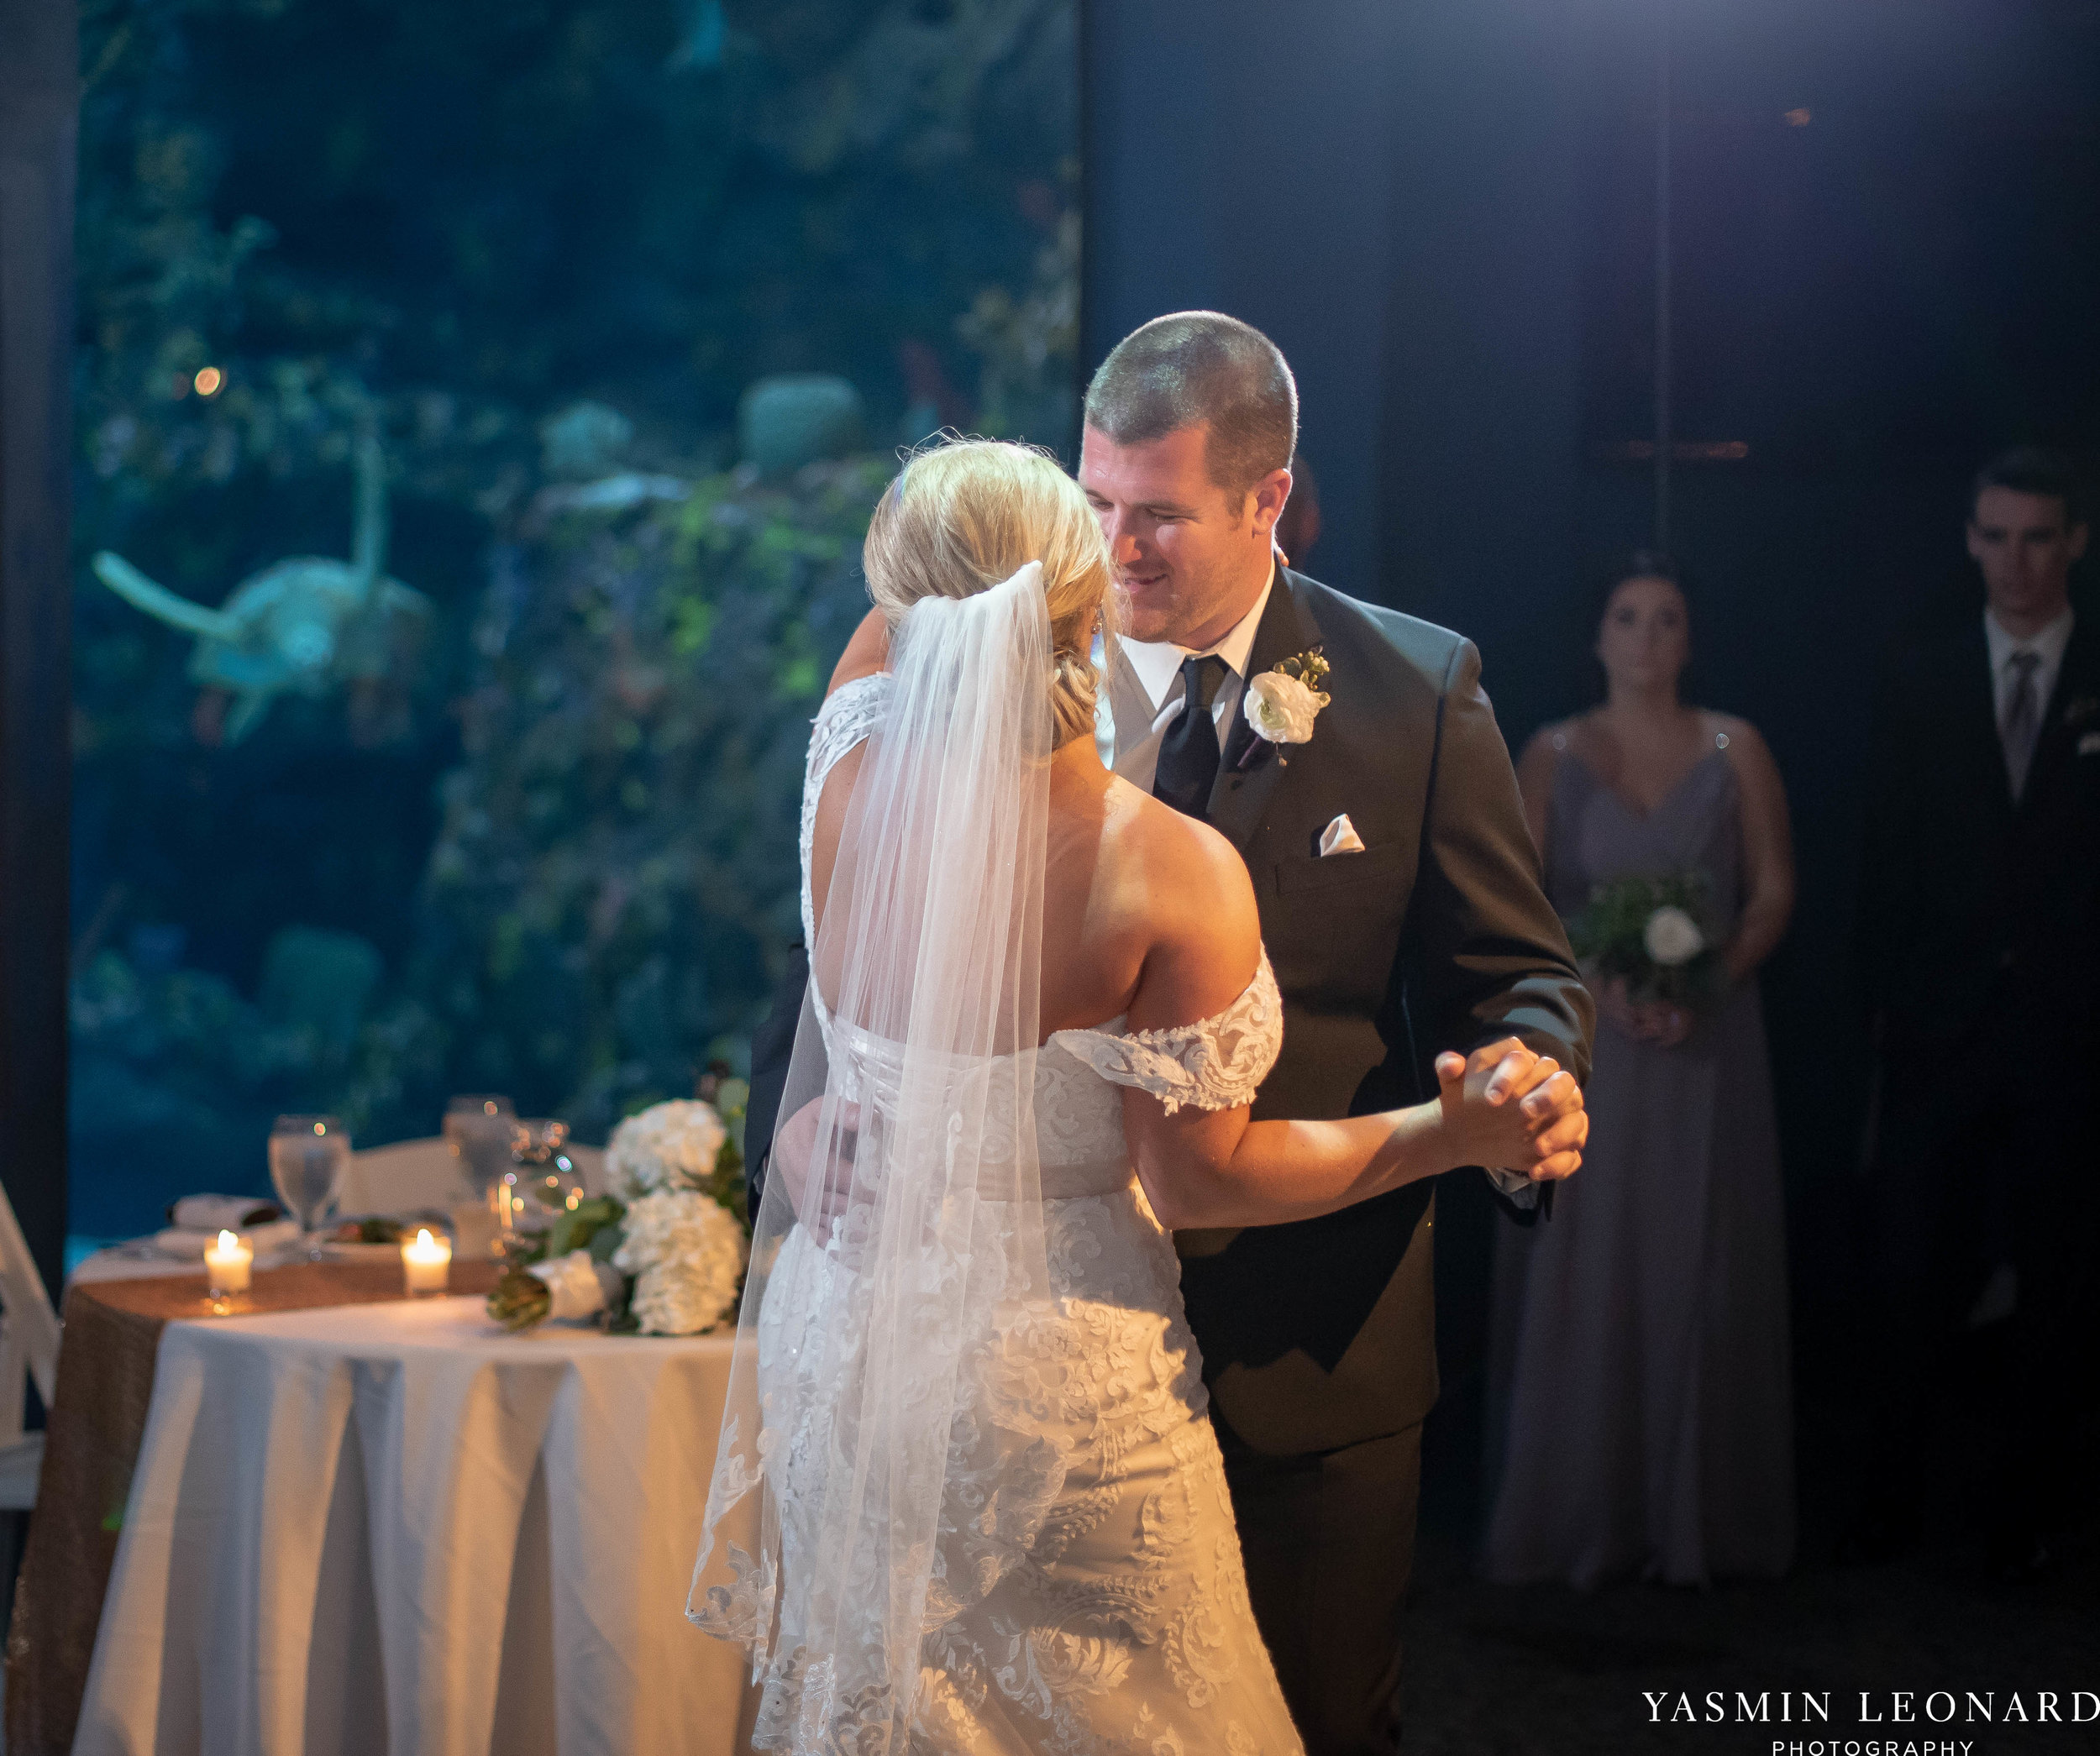 Carolina Beach Wedding - Fort Fisher Wedding - NC Acquarium - Beach Wedding - NC Wedding - Beach Wedding Inspiration - Beach Bride-42.jpg